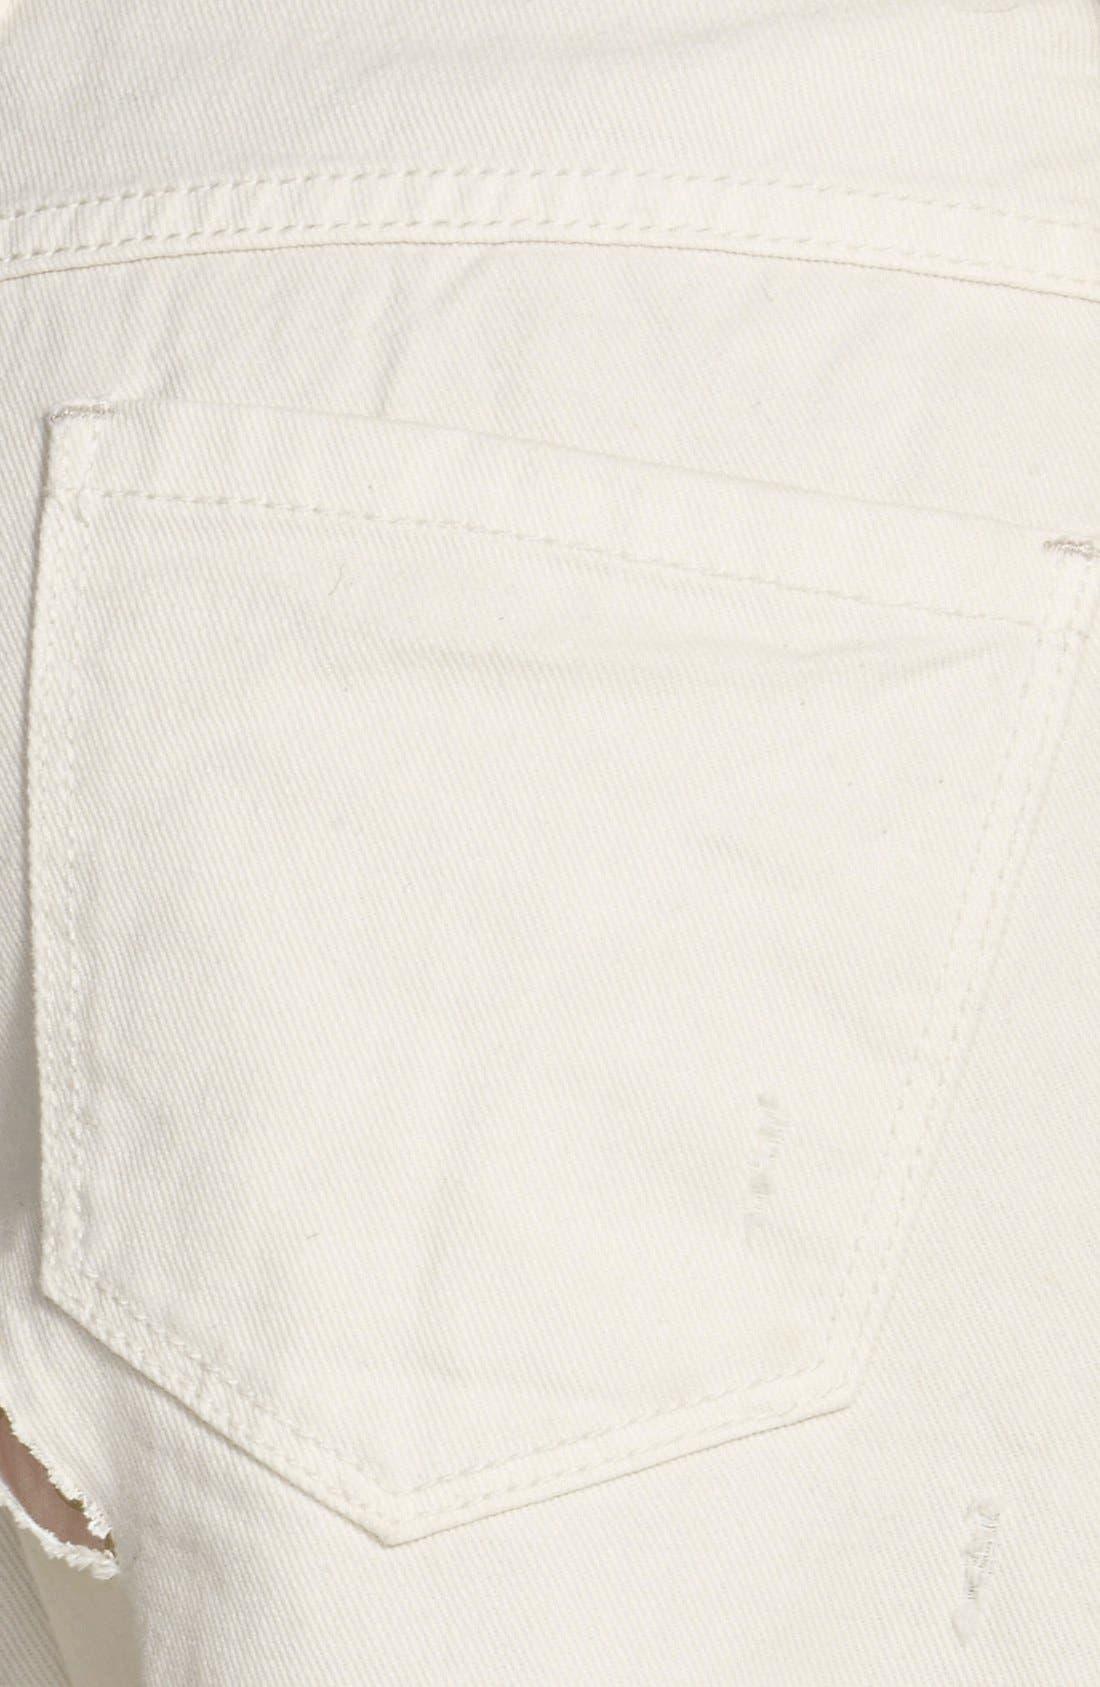 Alternate Image 3  - Free People 'Runaway' Cutoff Denim Shorts (Polar White)